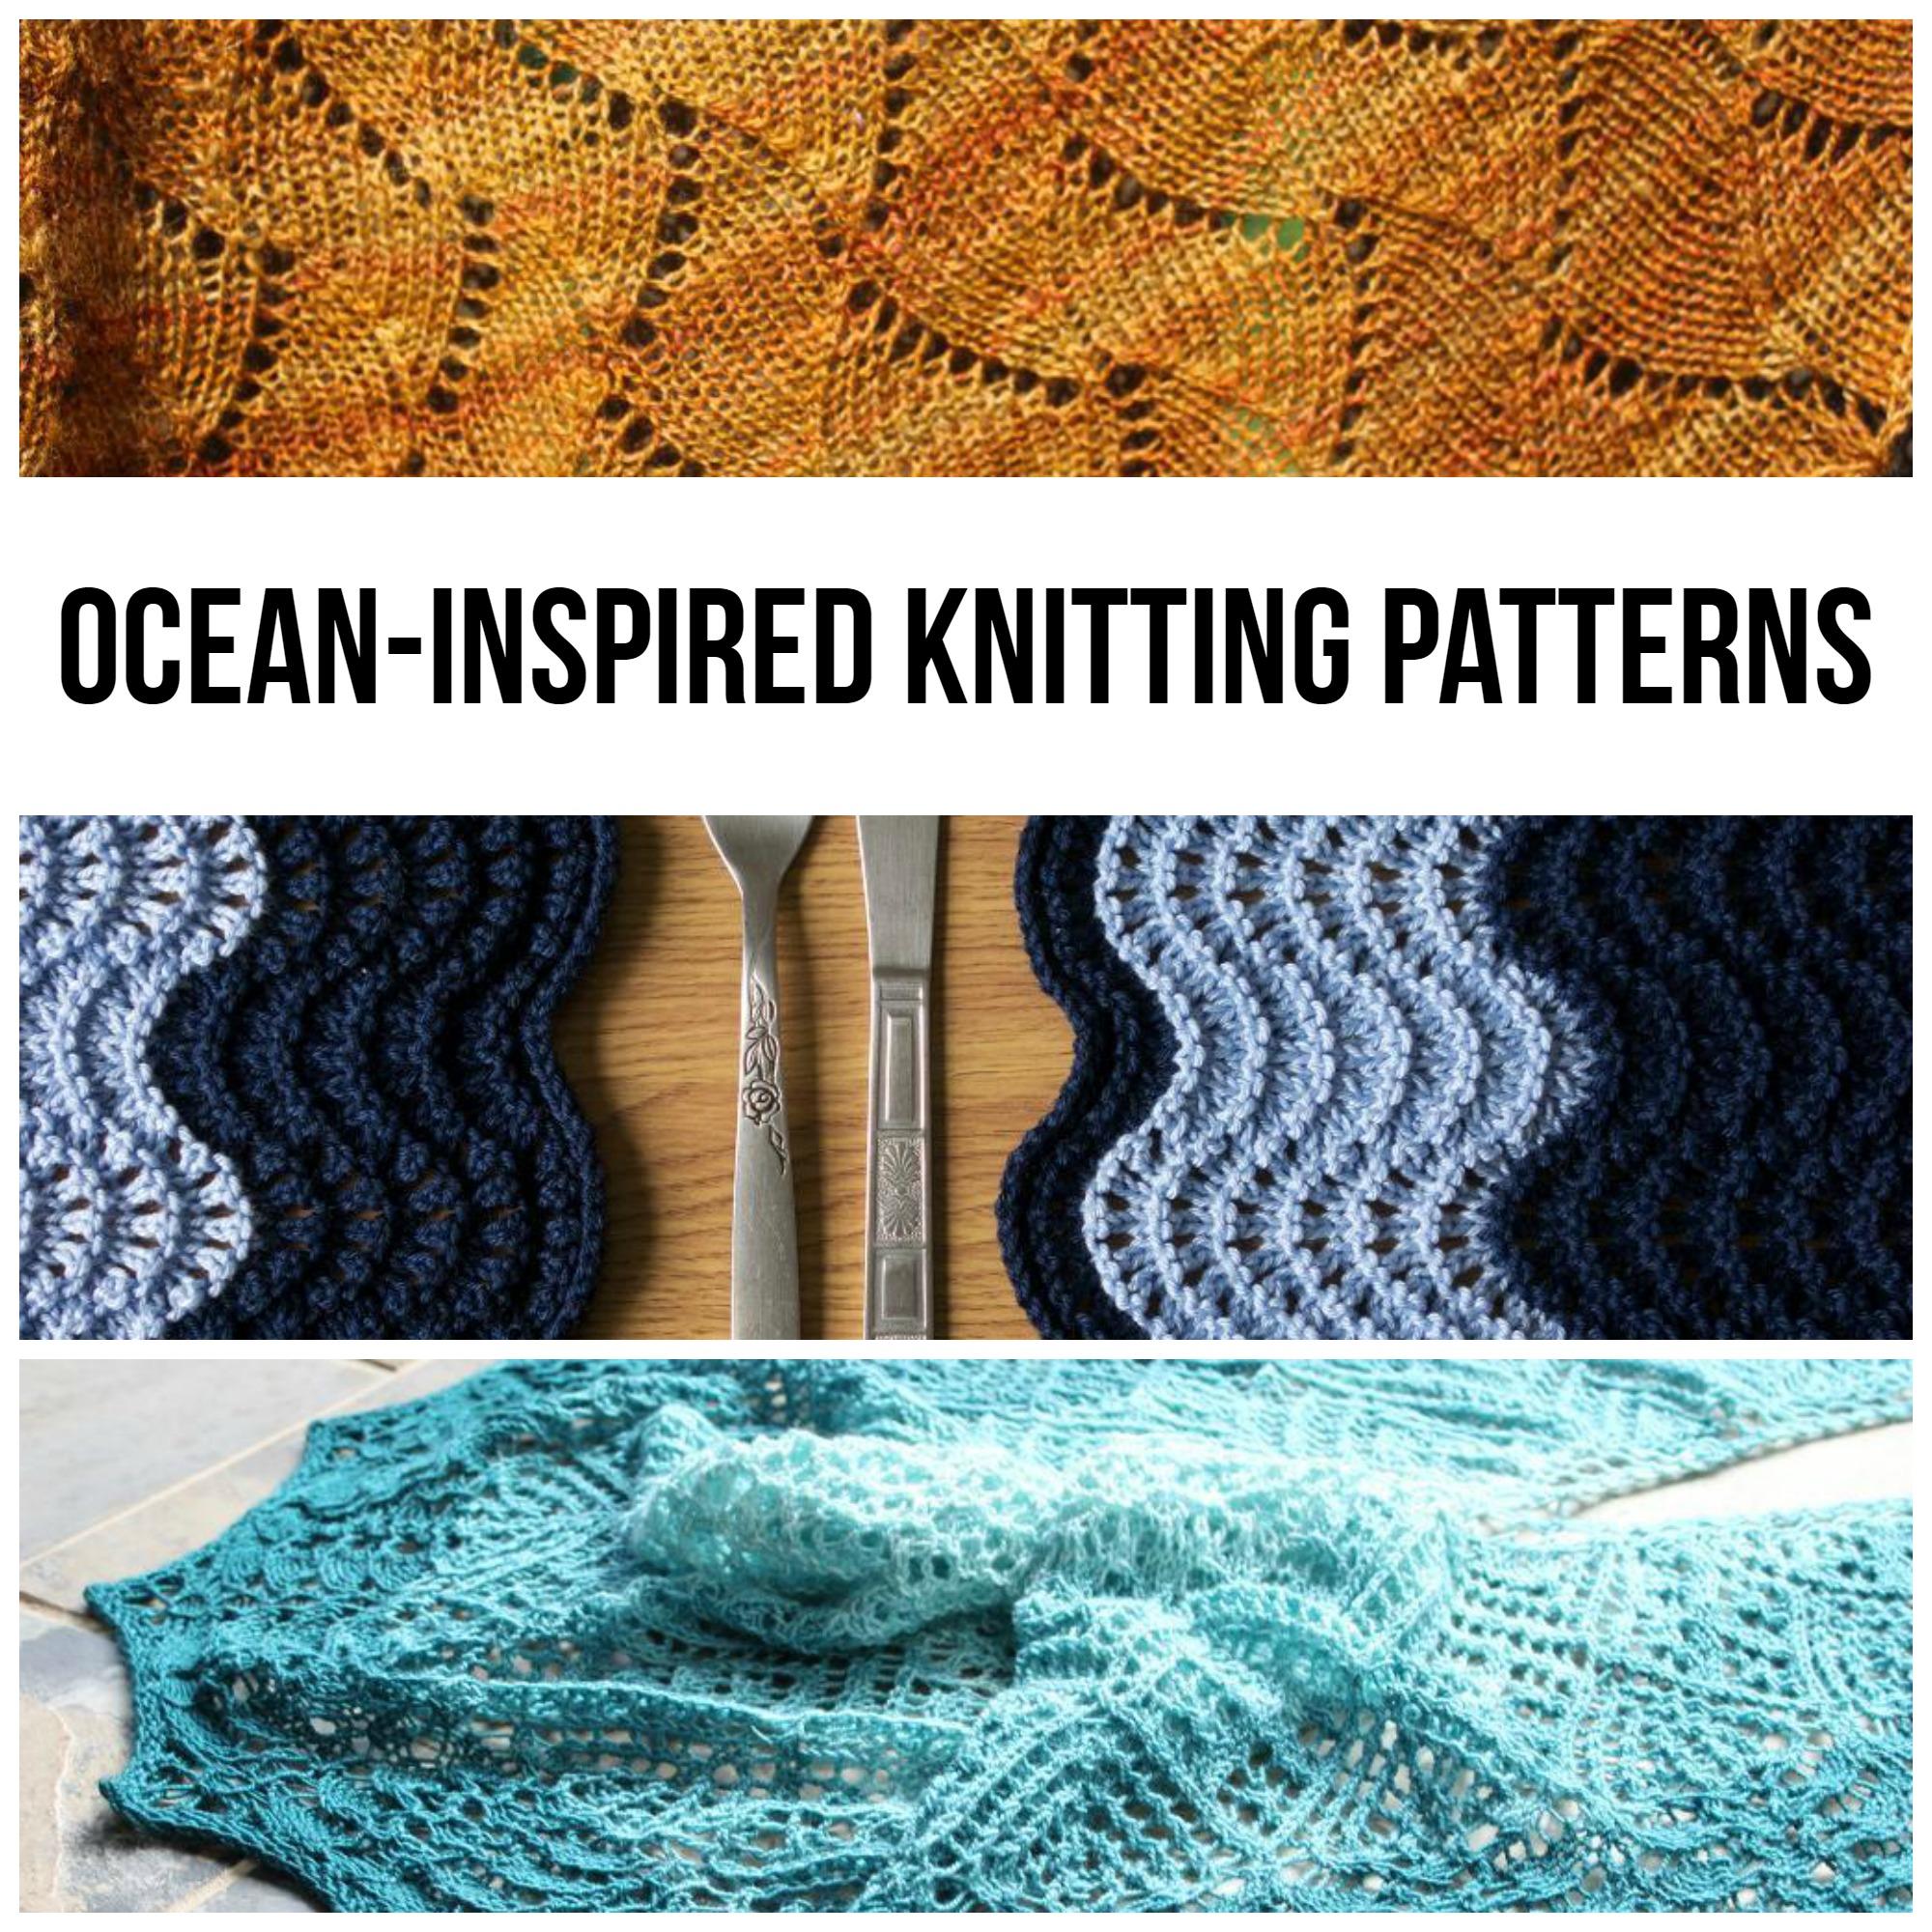 Ocean-Inspired Knitting Patterns